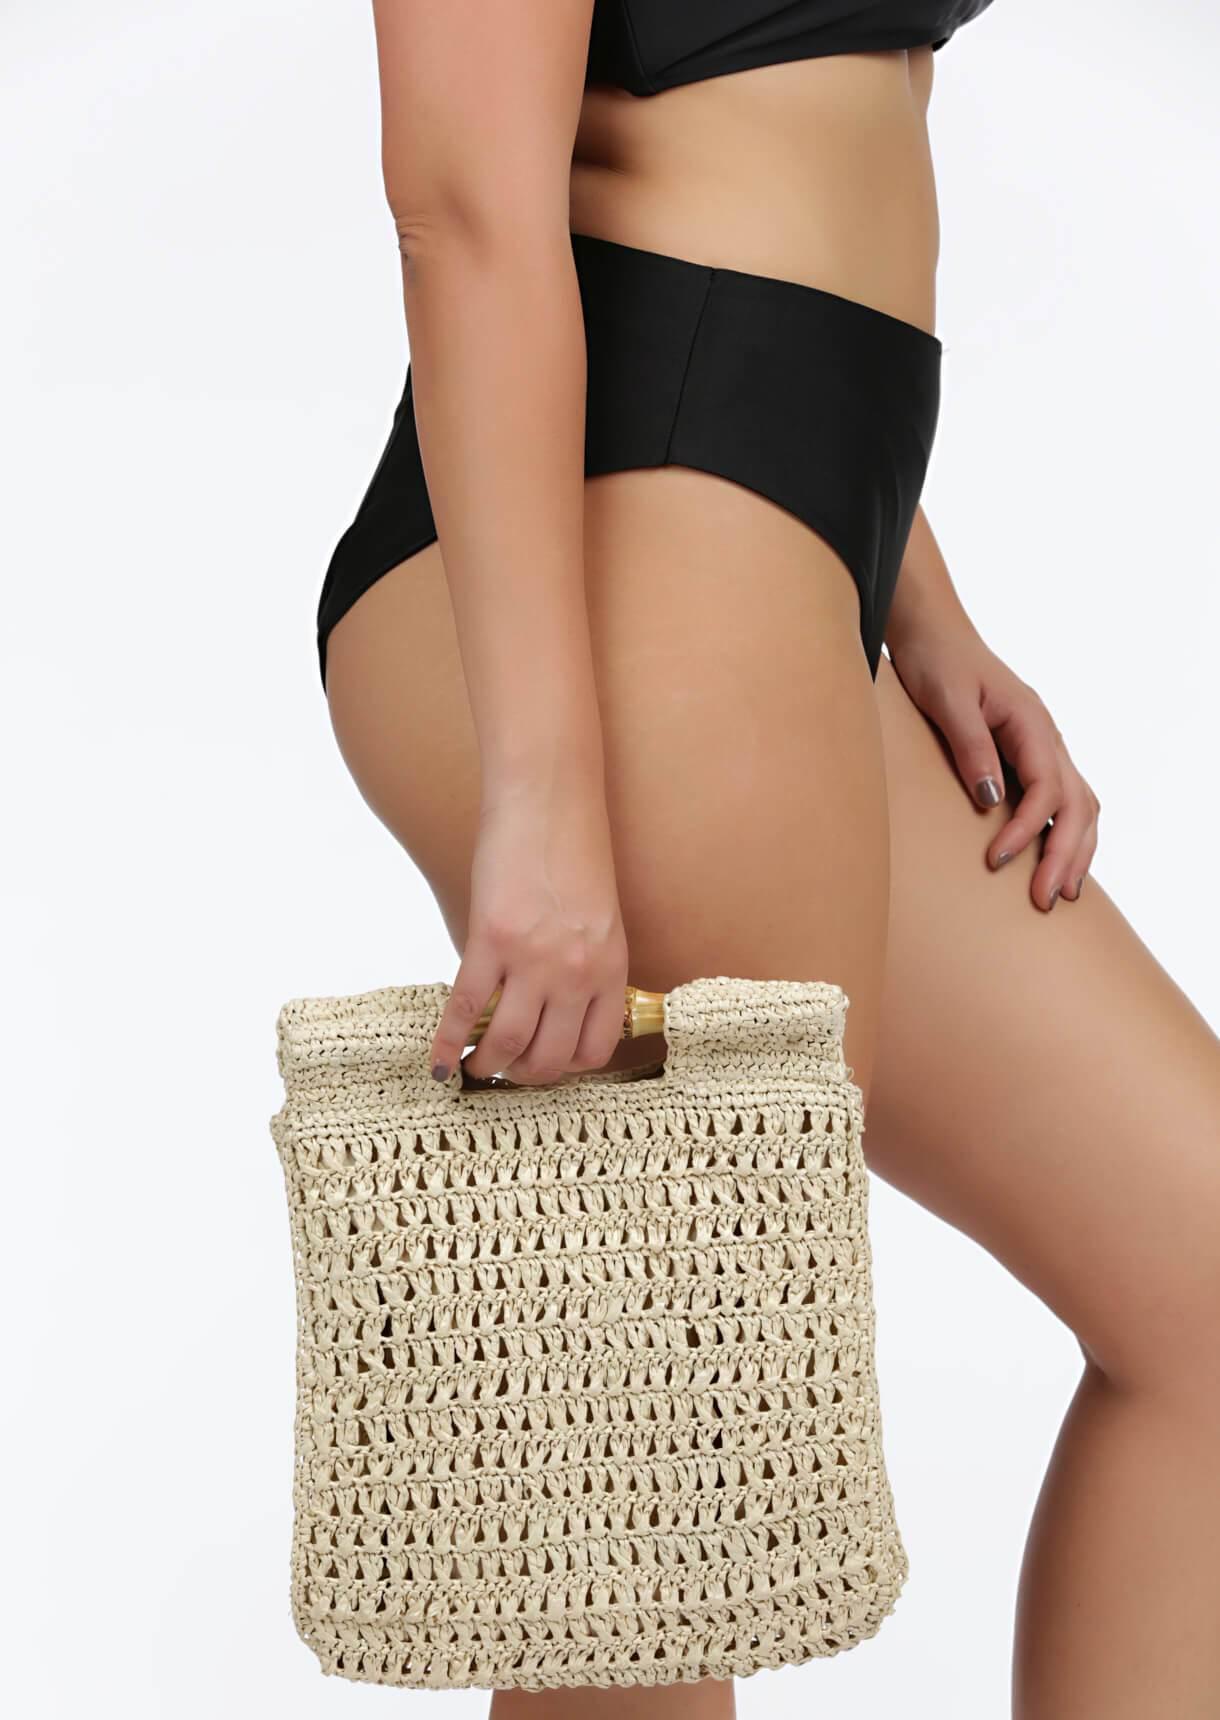 Impulse Fashion Accessories/ Gabby's Jewellery Cream Bamboo Handle Natural Bag